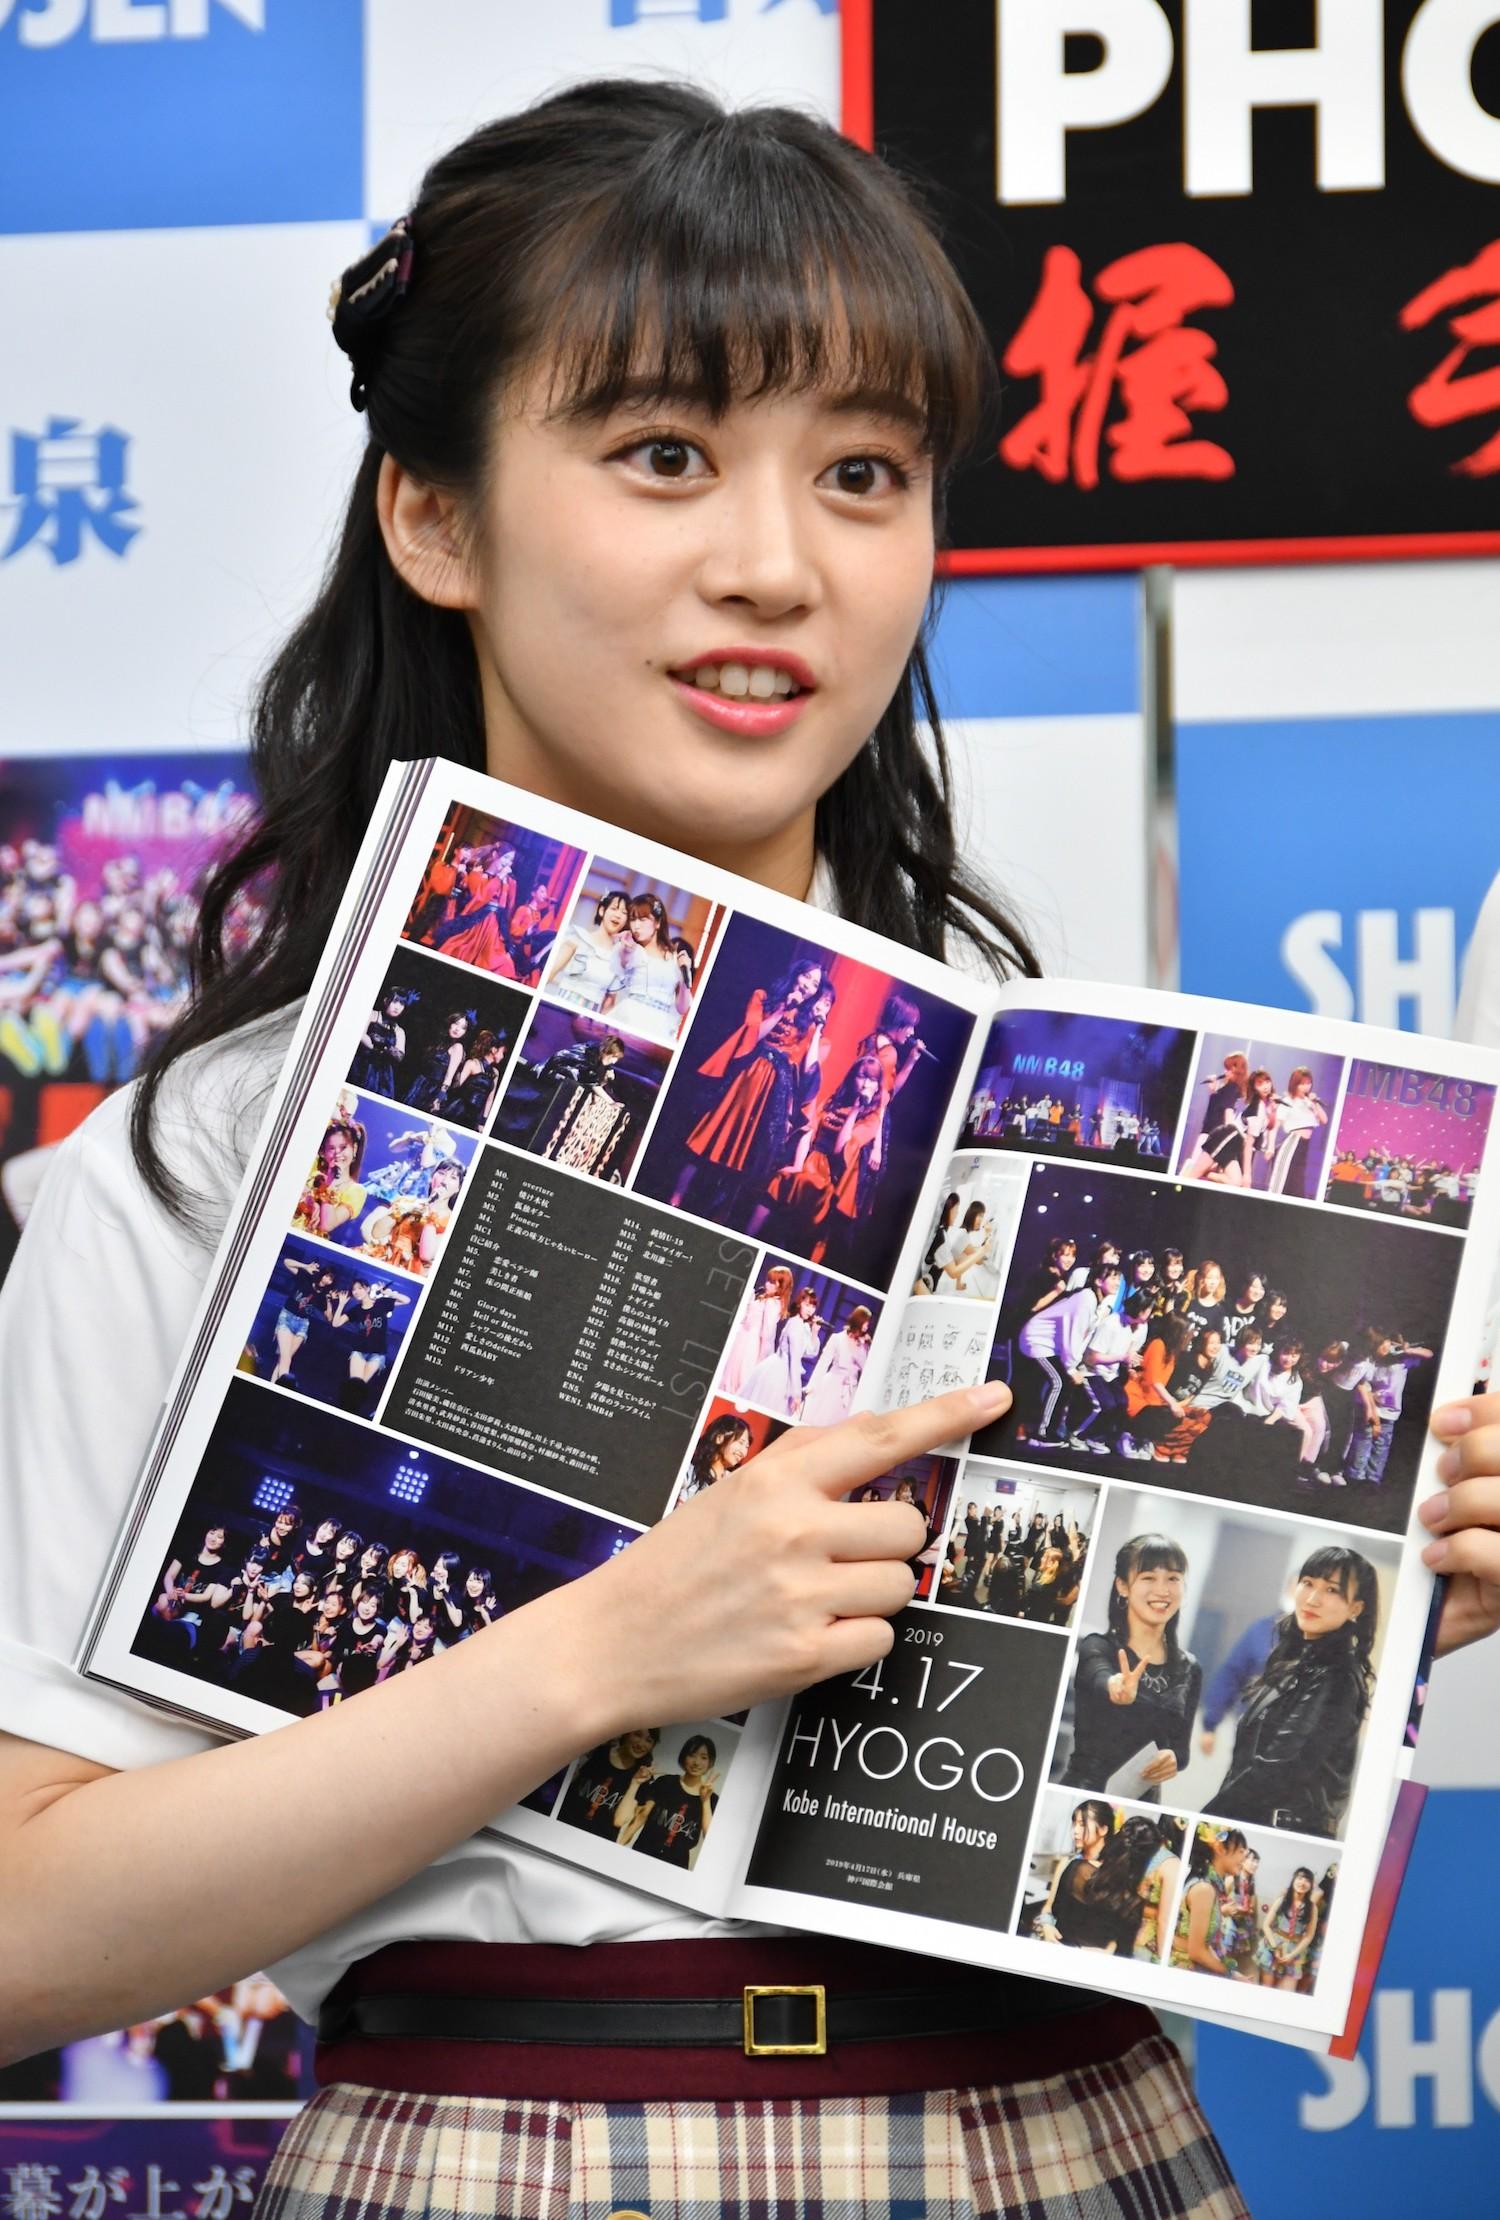 NMB48の小嶋花梨PHOTOBOOK(東京ニュース通信社刊)発売記念握手会(2019年9月5日)